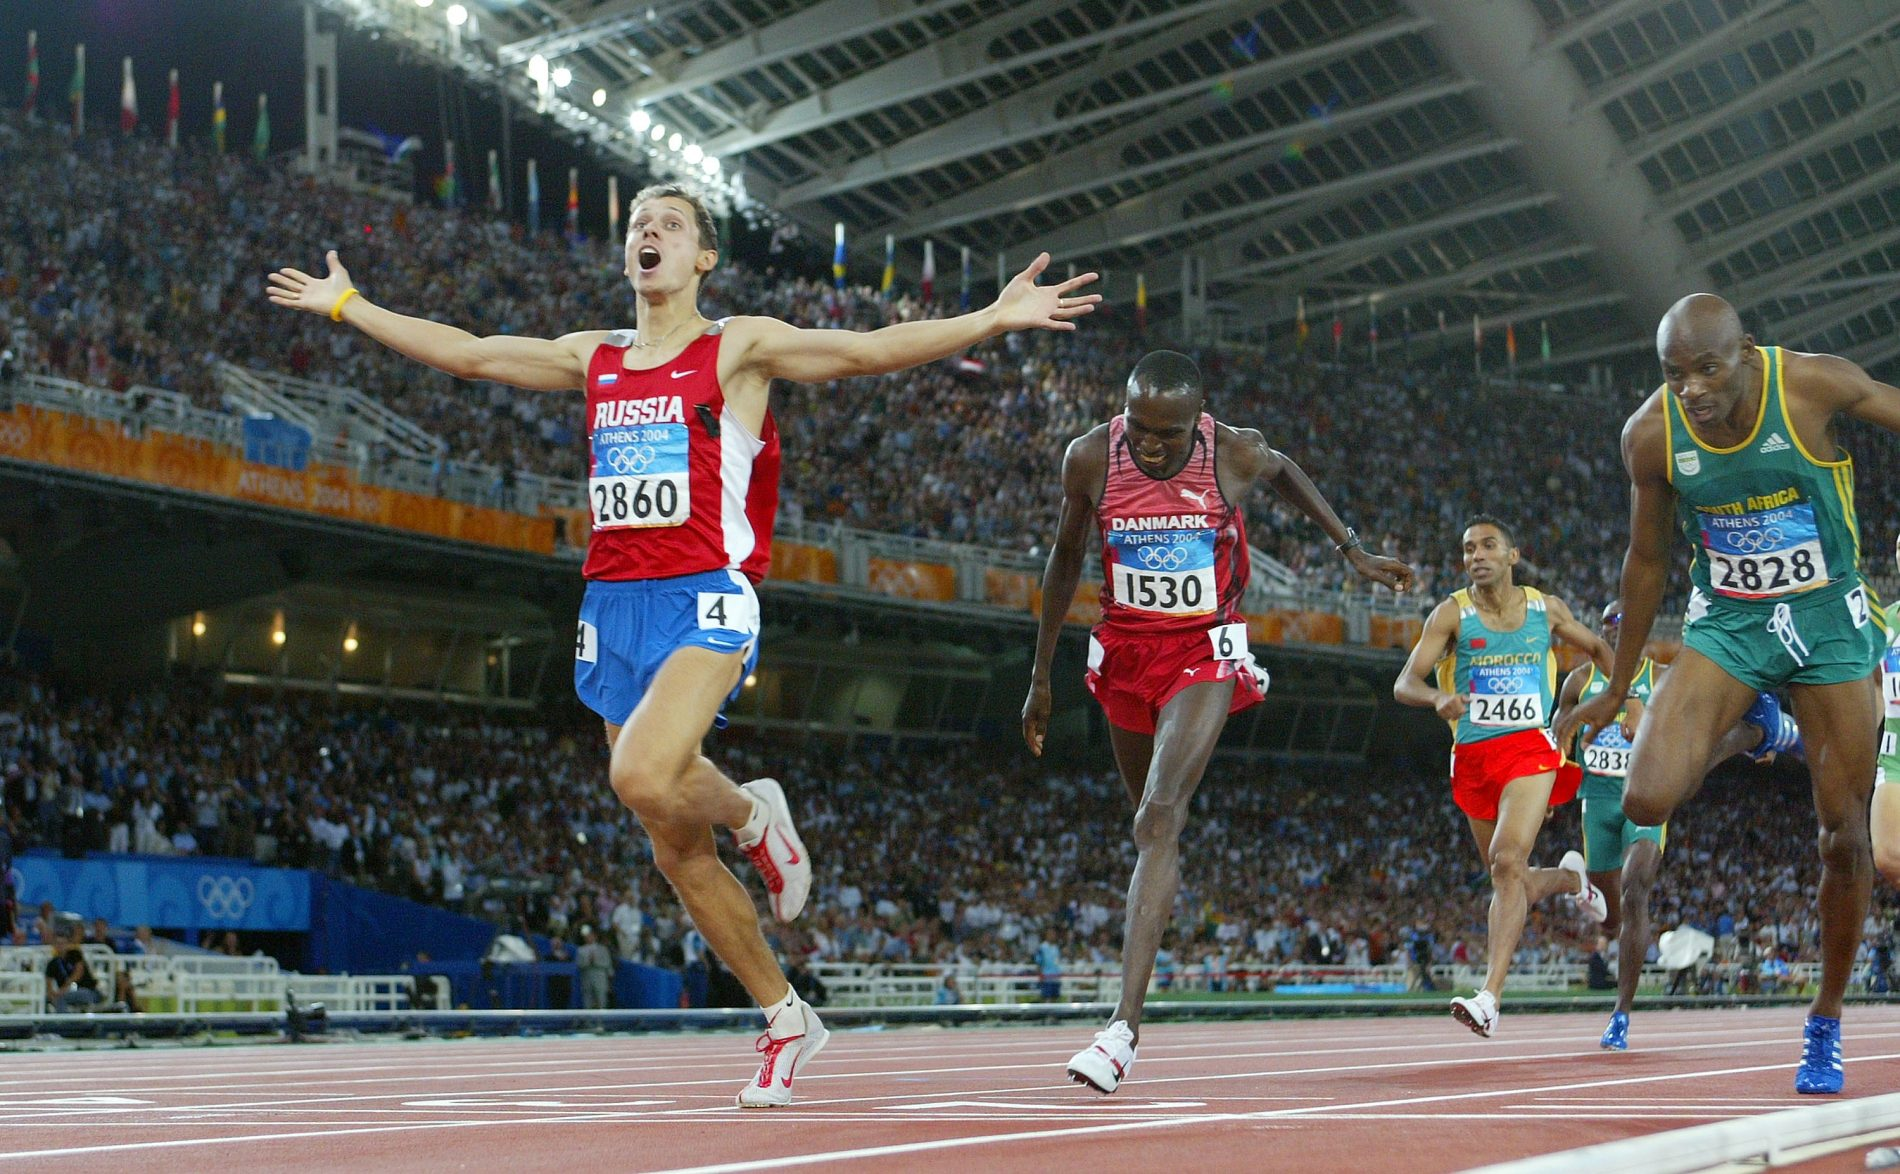 жизни картинки олимпийский бег знаете где спеть